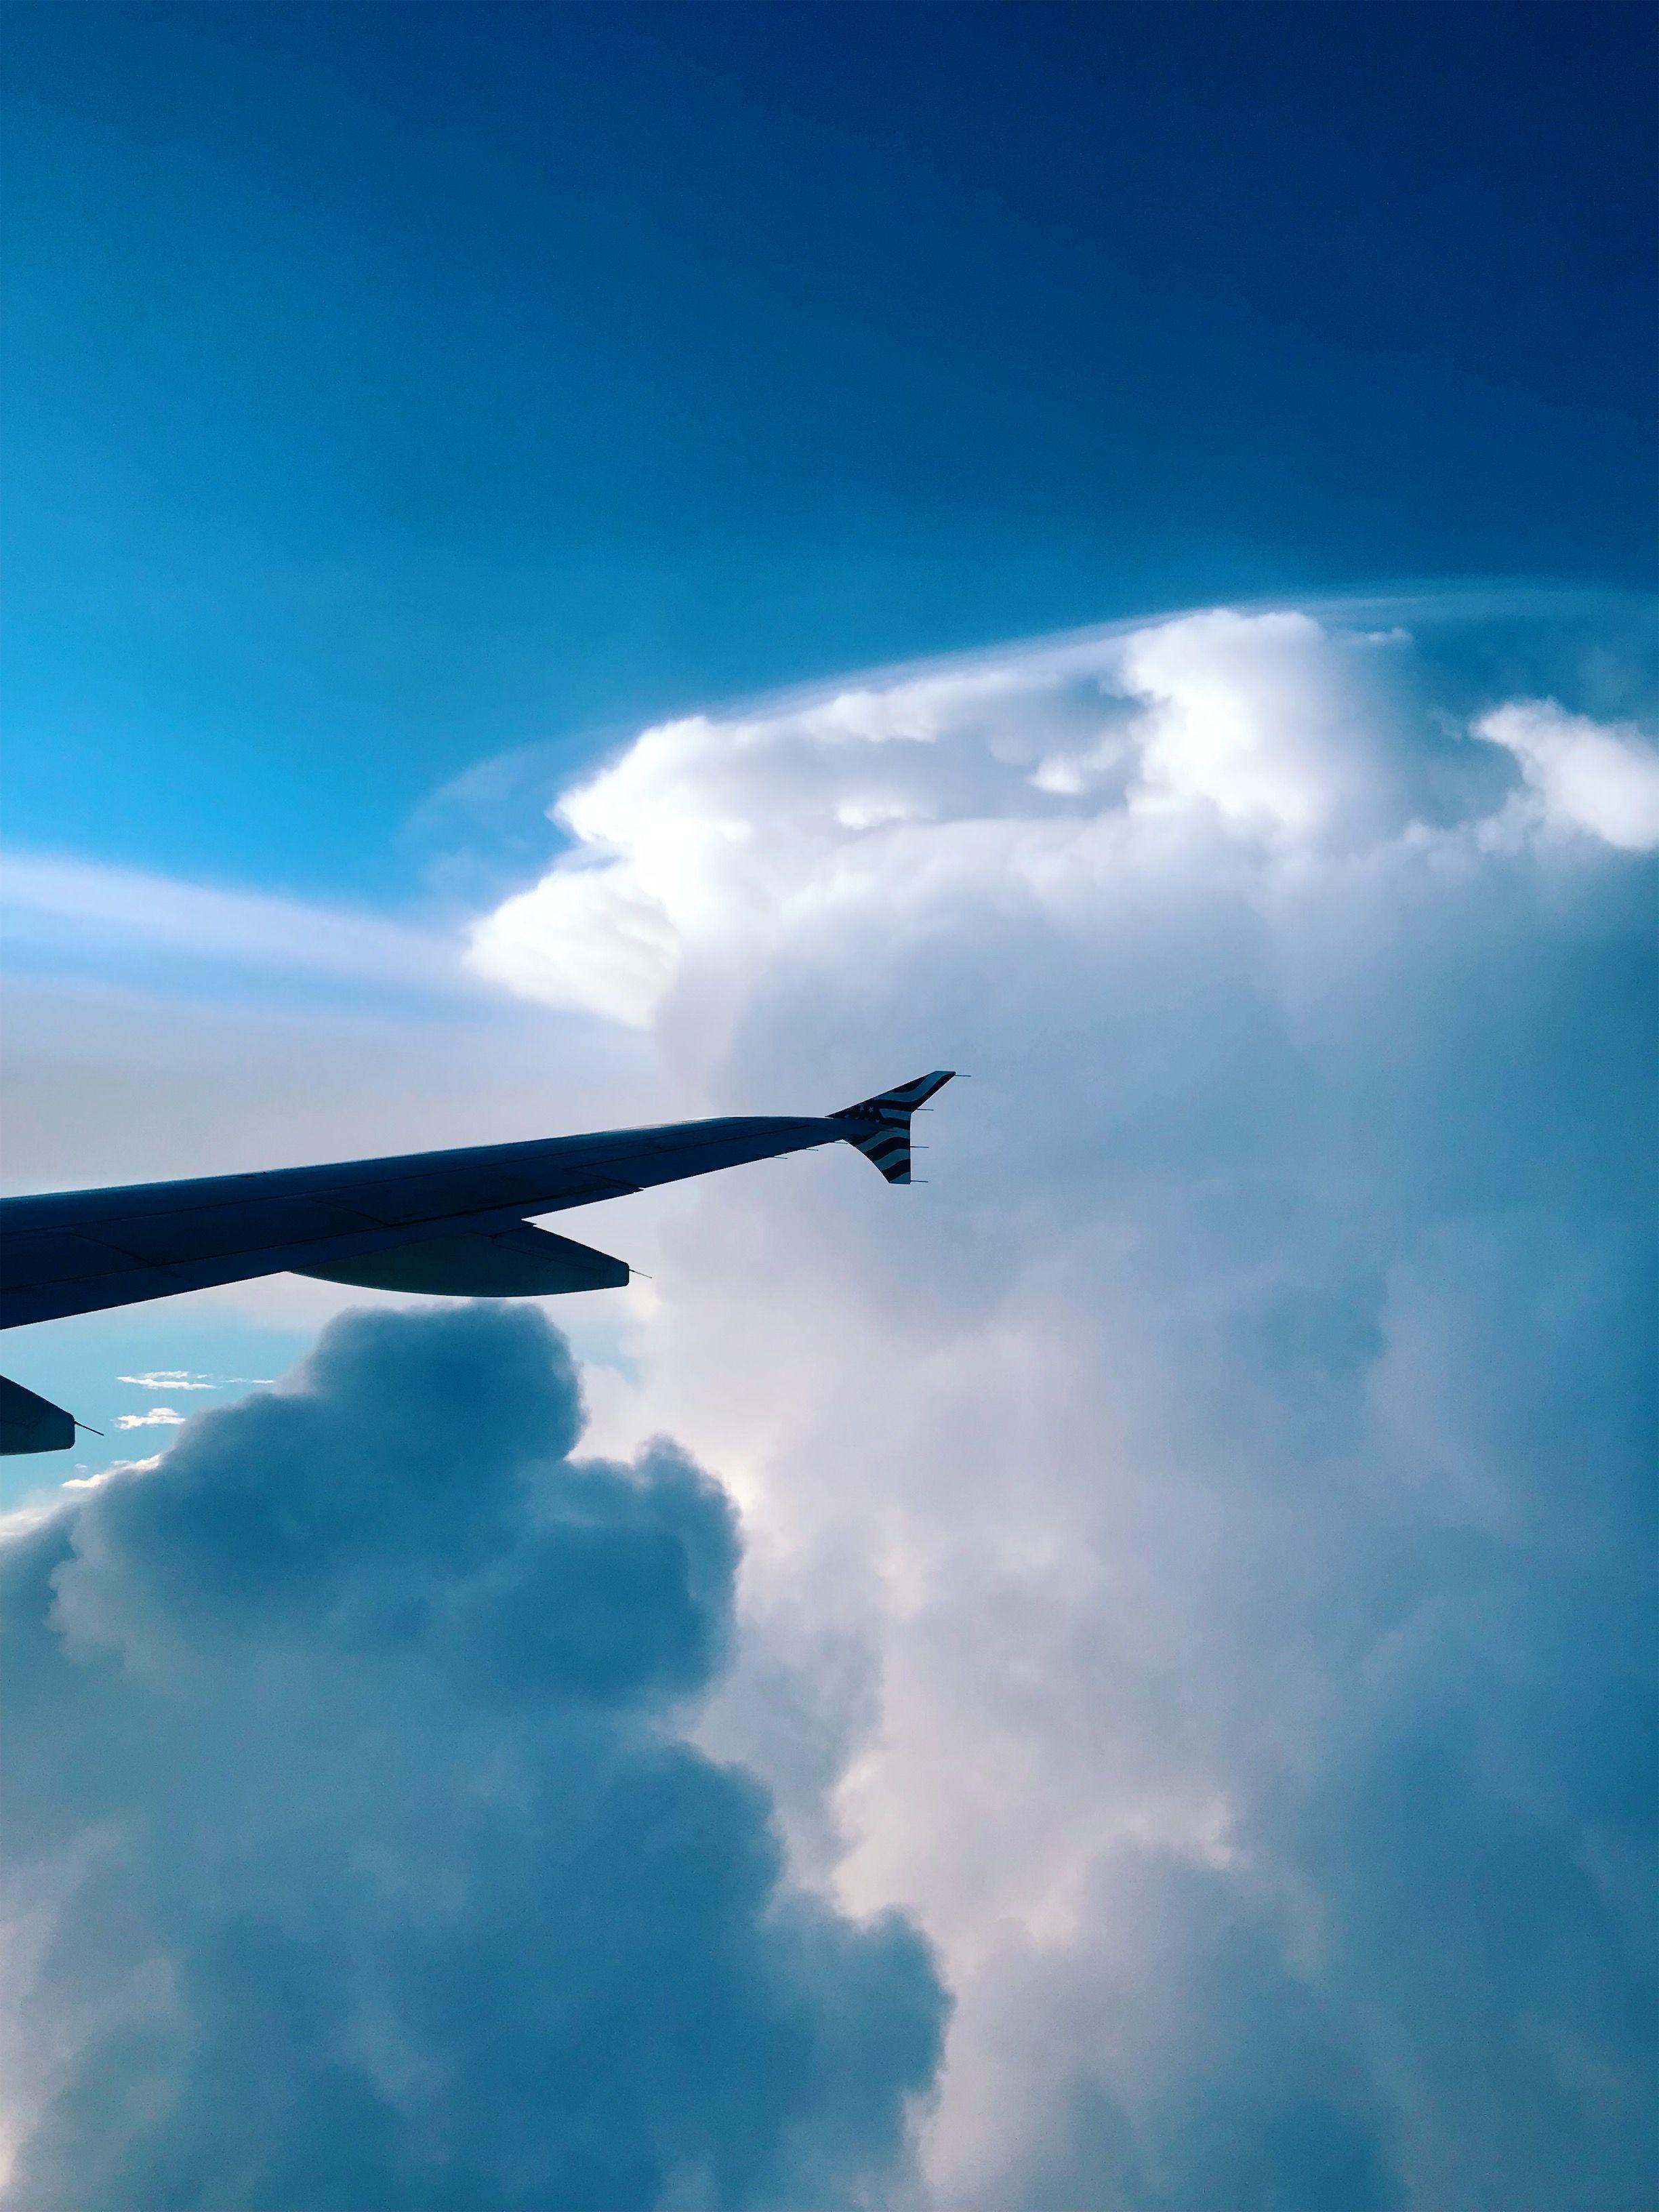 Tremendous Airplane Plane Window Seat Views Sky Wing Flight Flights Beatyapartments Chair Design Images Beatyapartmentscom